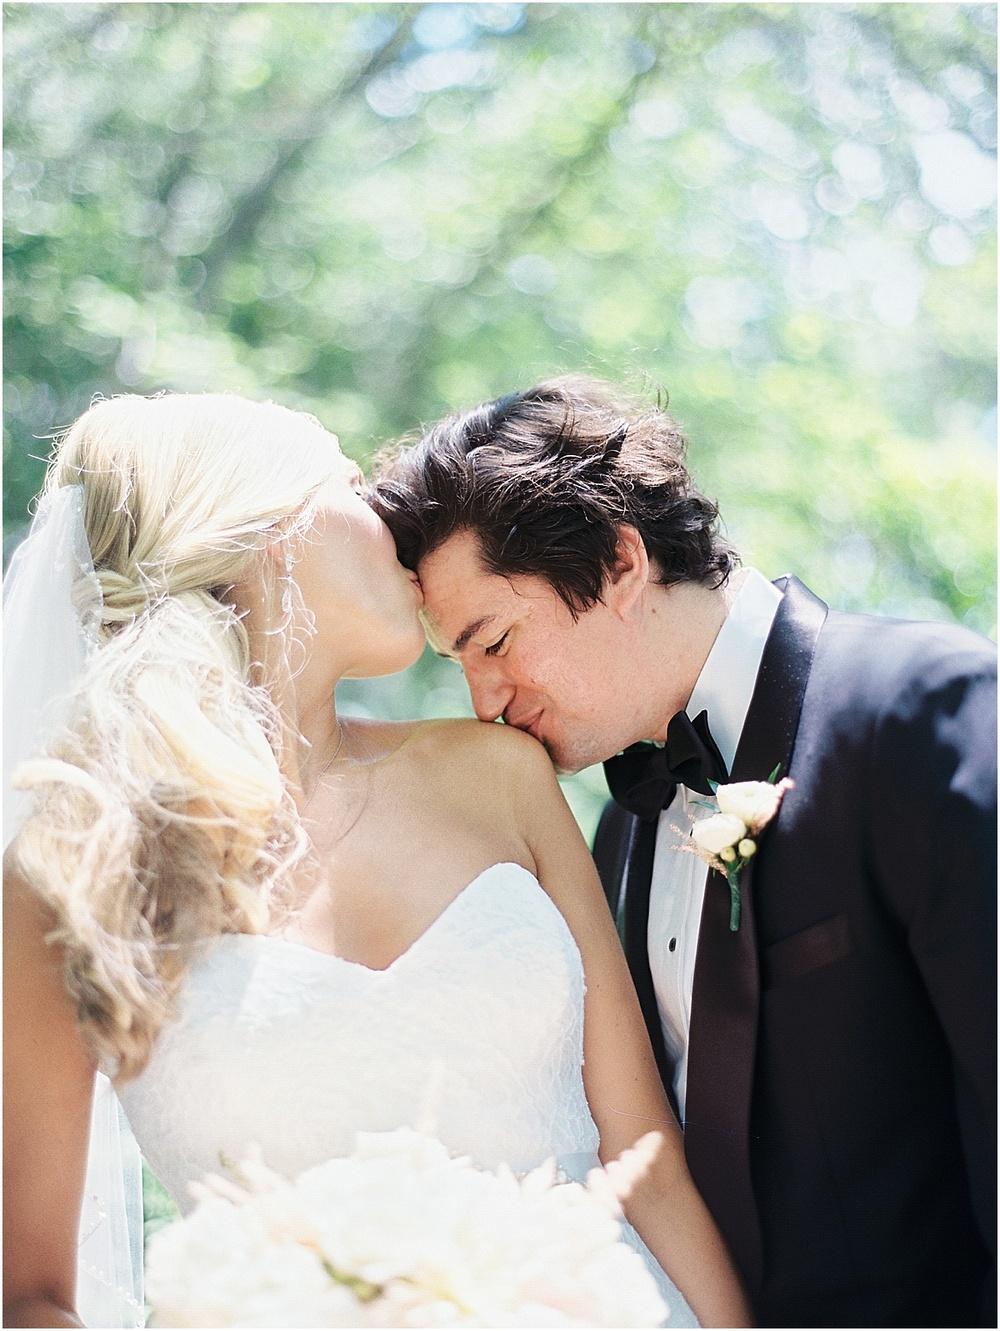 St_Louis_Wedding_Fine_Art_Film_Photographer_Jordan_Brittley_(www.jordanbrittley.com)_0012.jpg